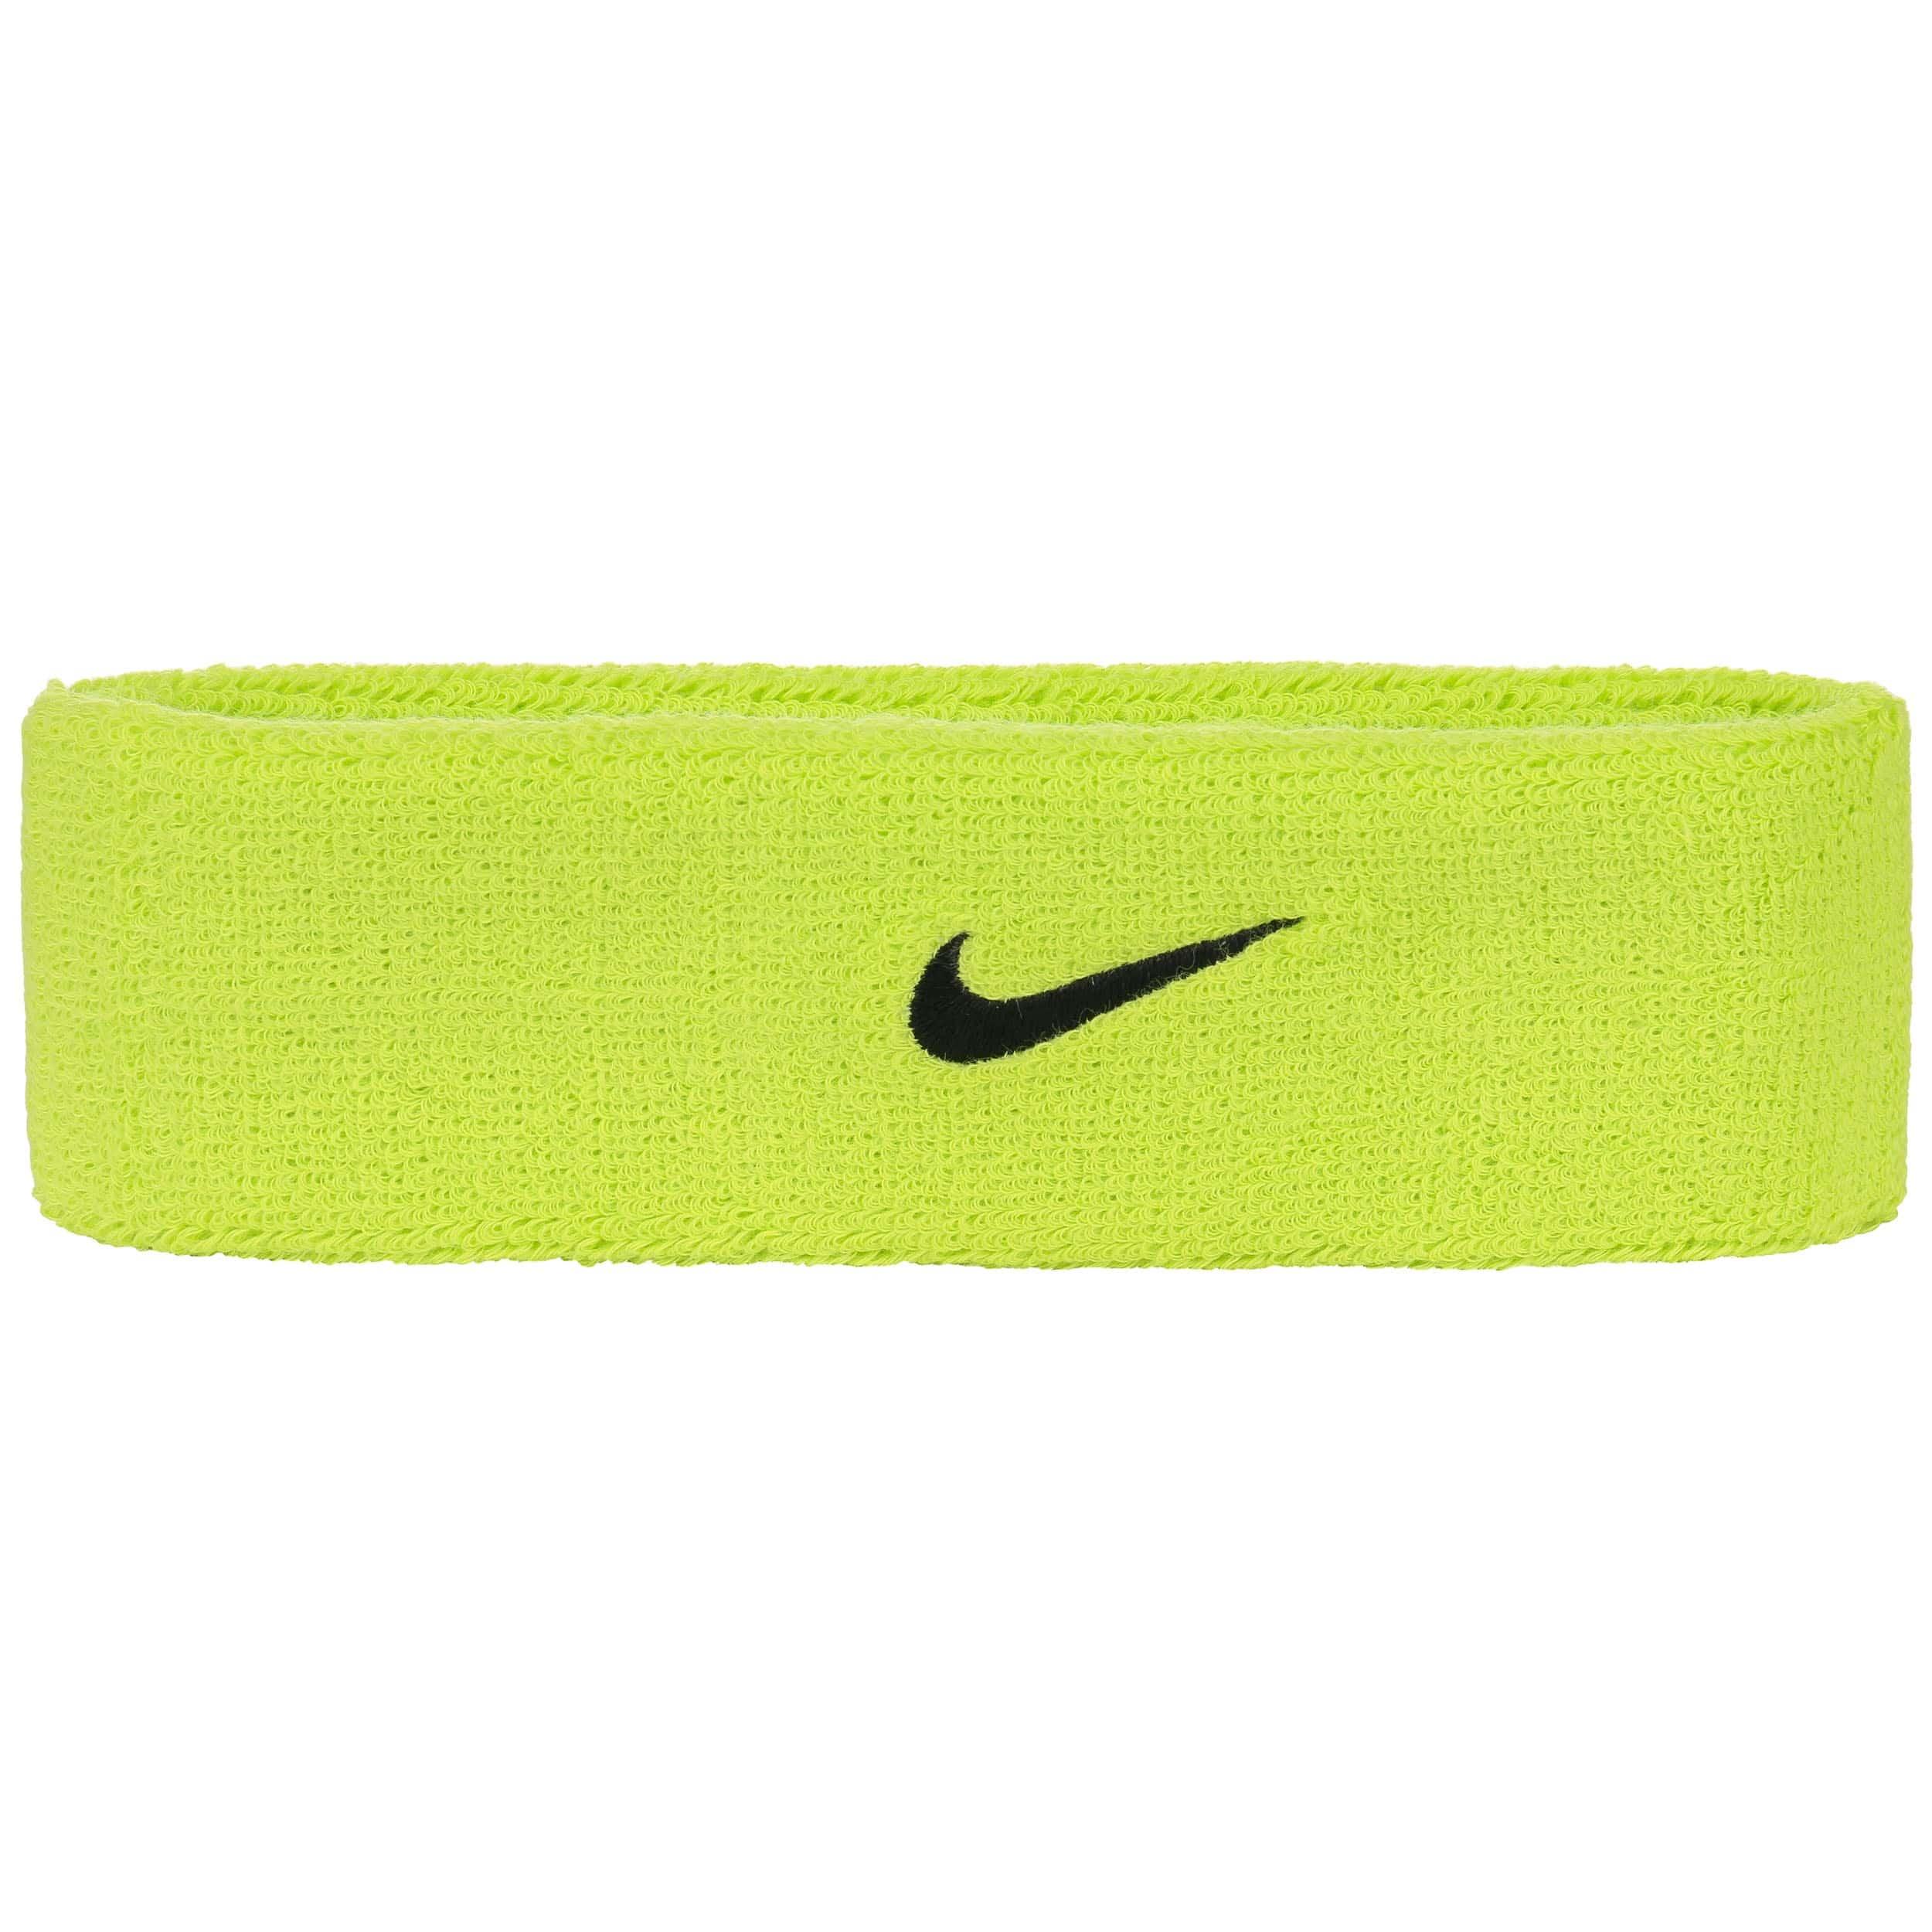 ... Swoosh Headband by Nike - neon green 2 ... 76f719945df